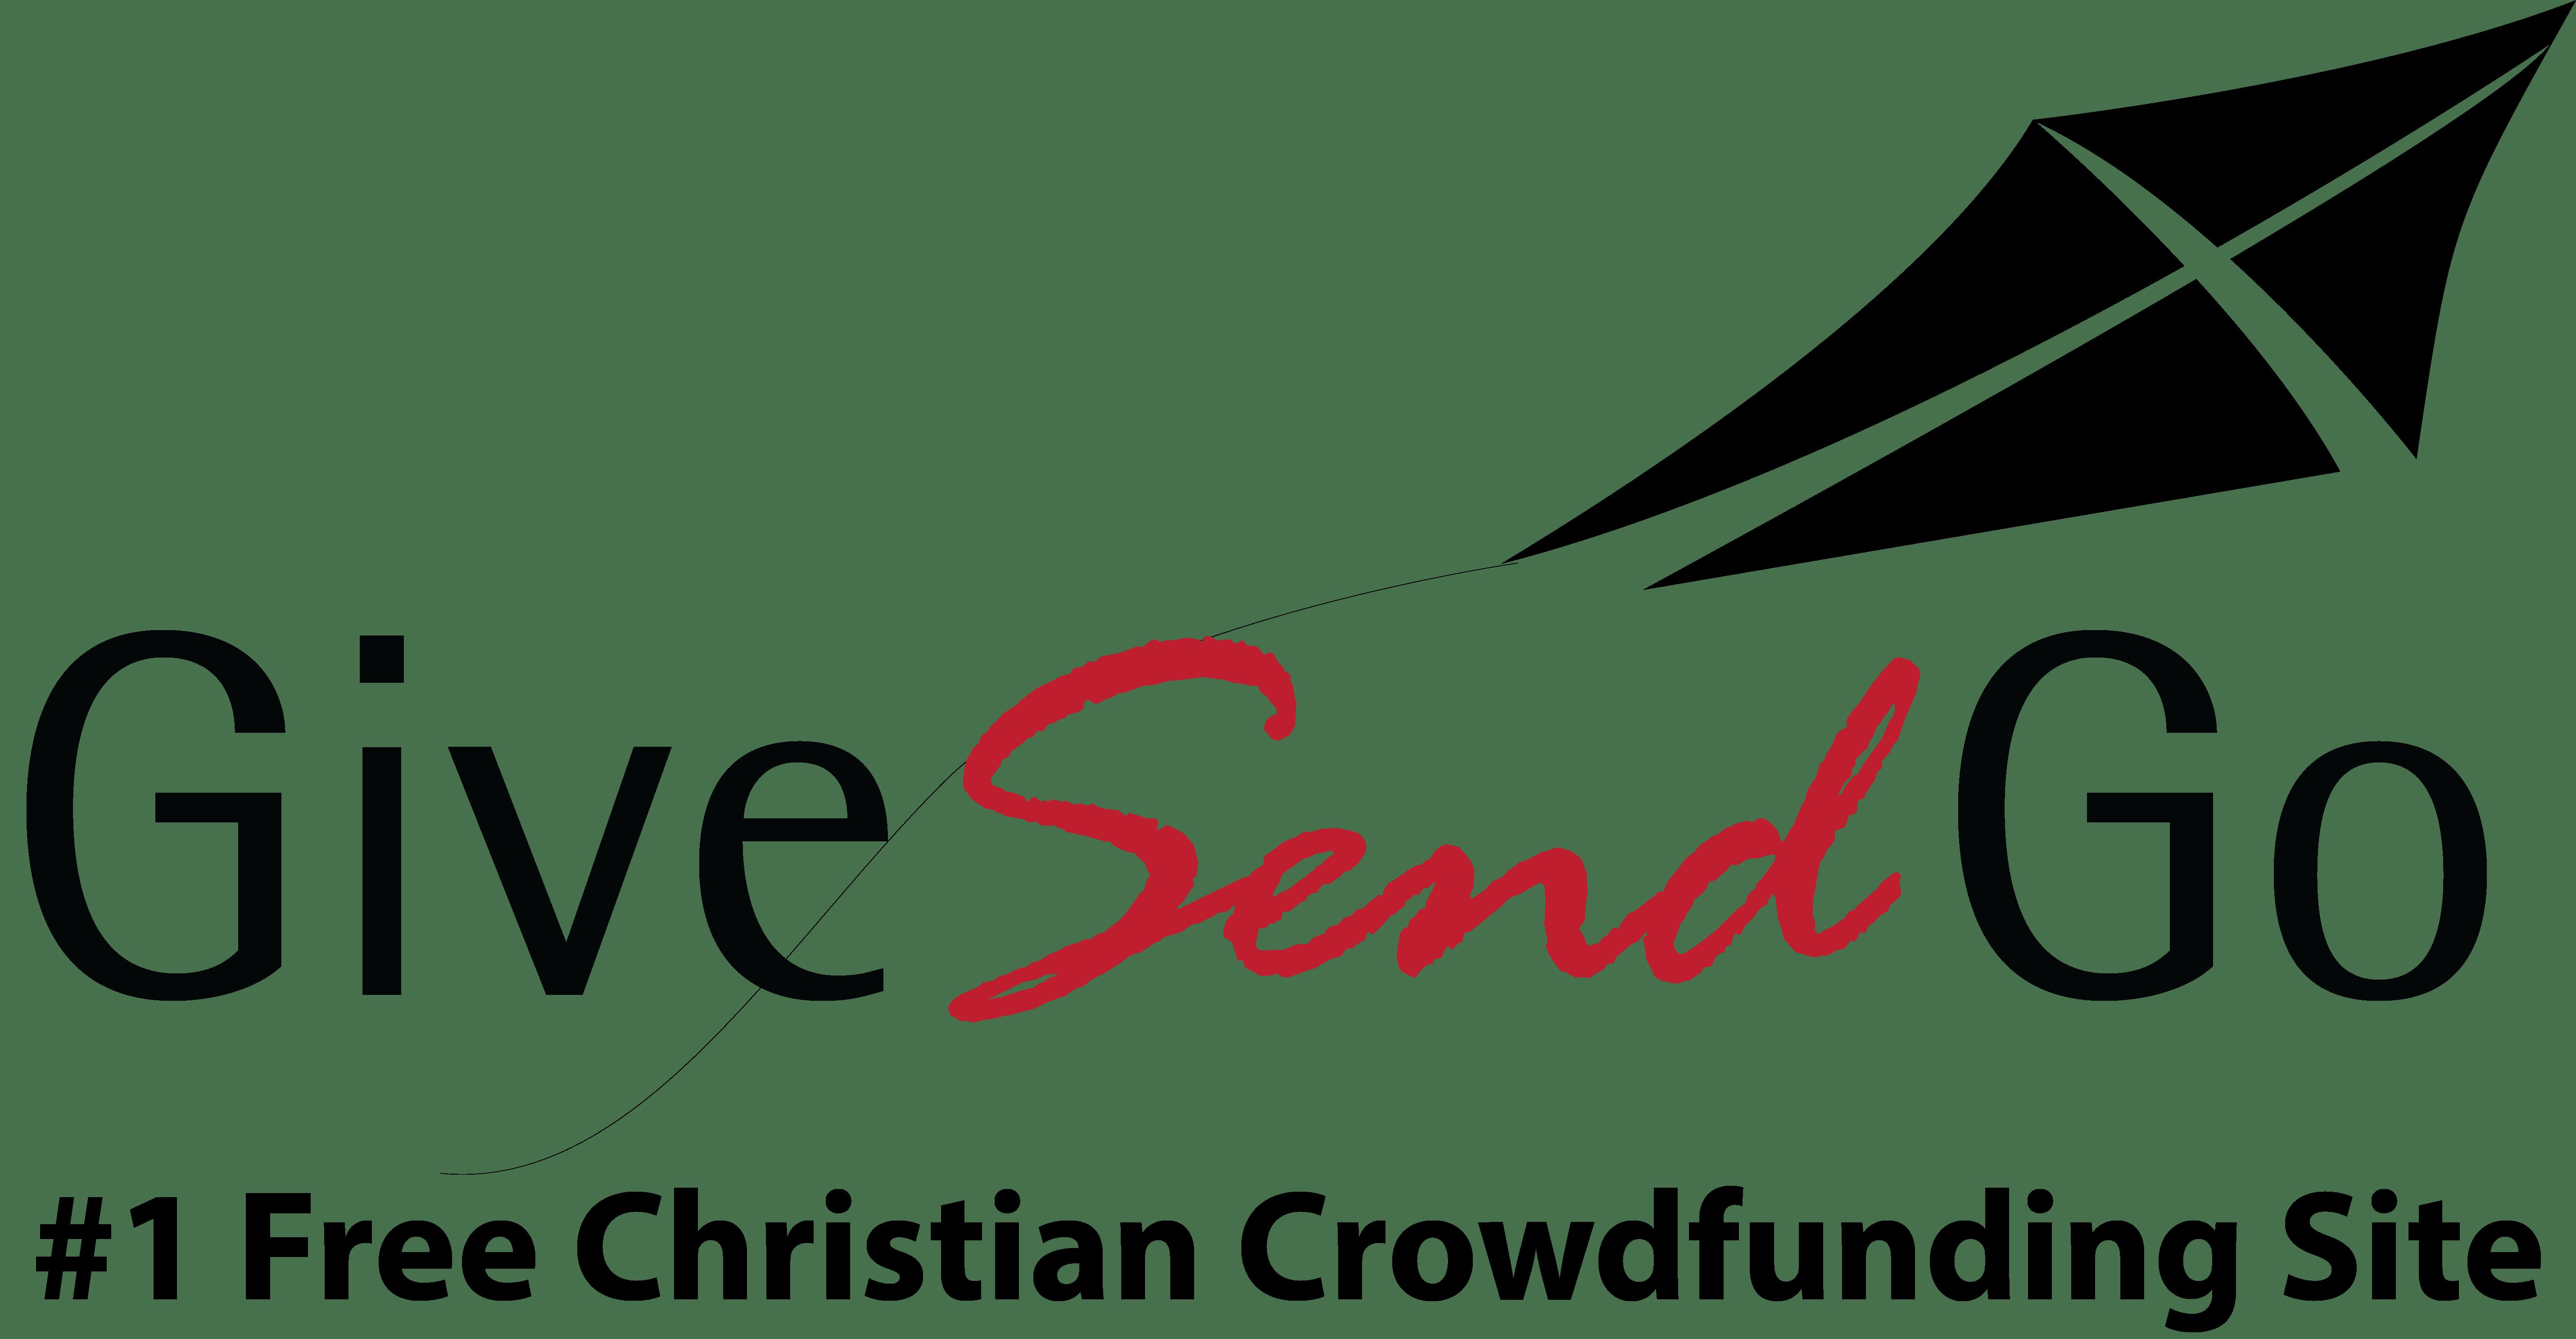 GiveSendGo Logo